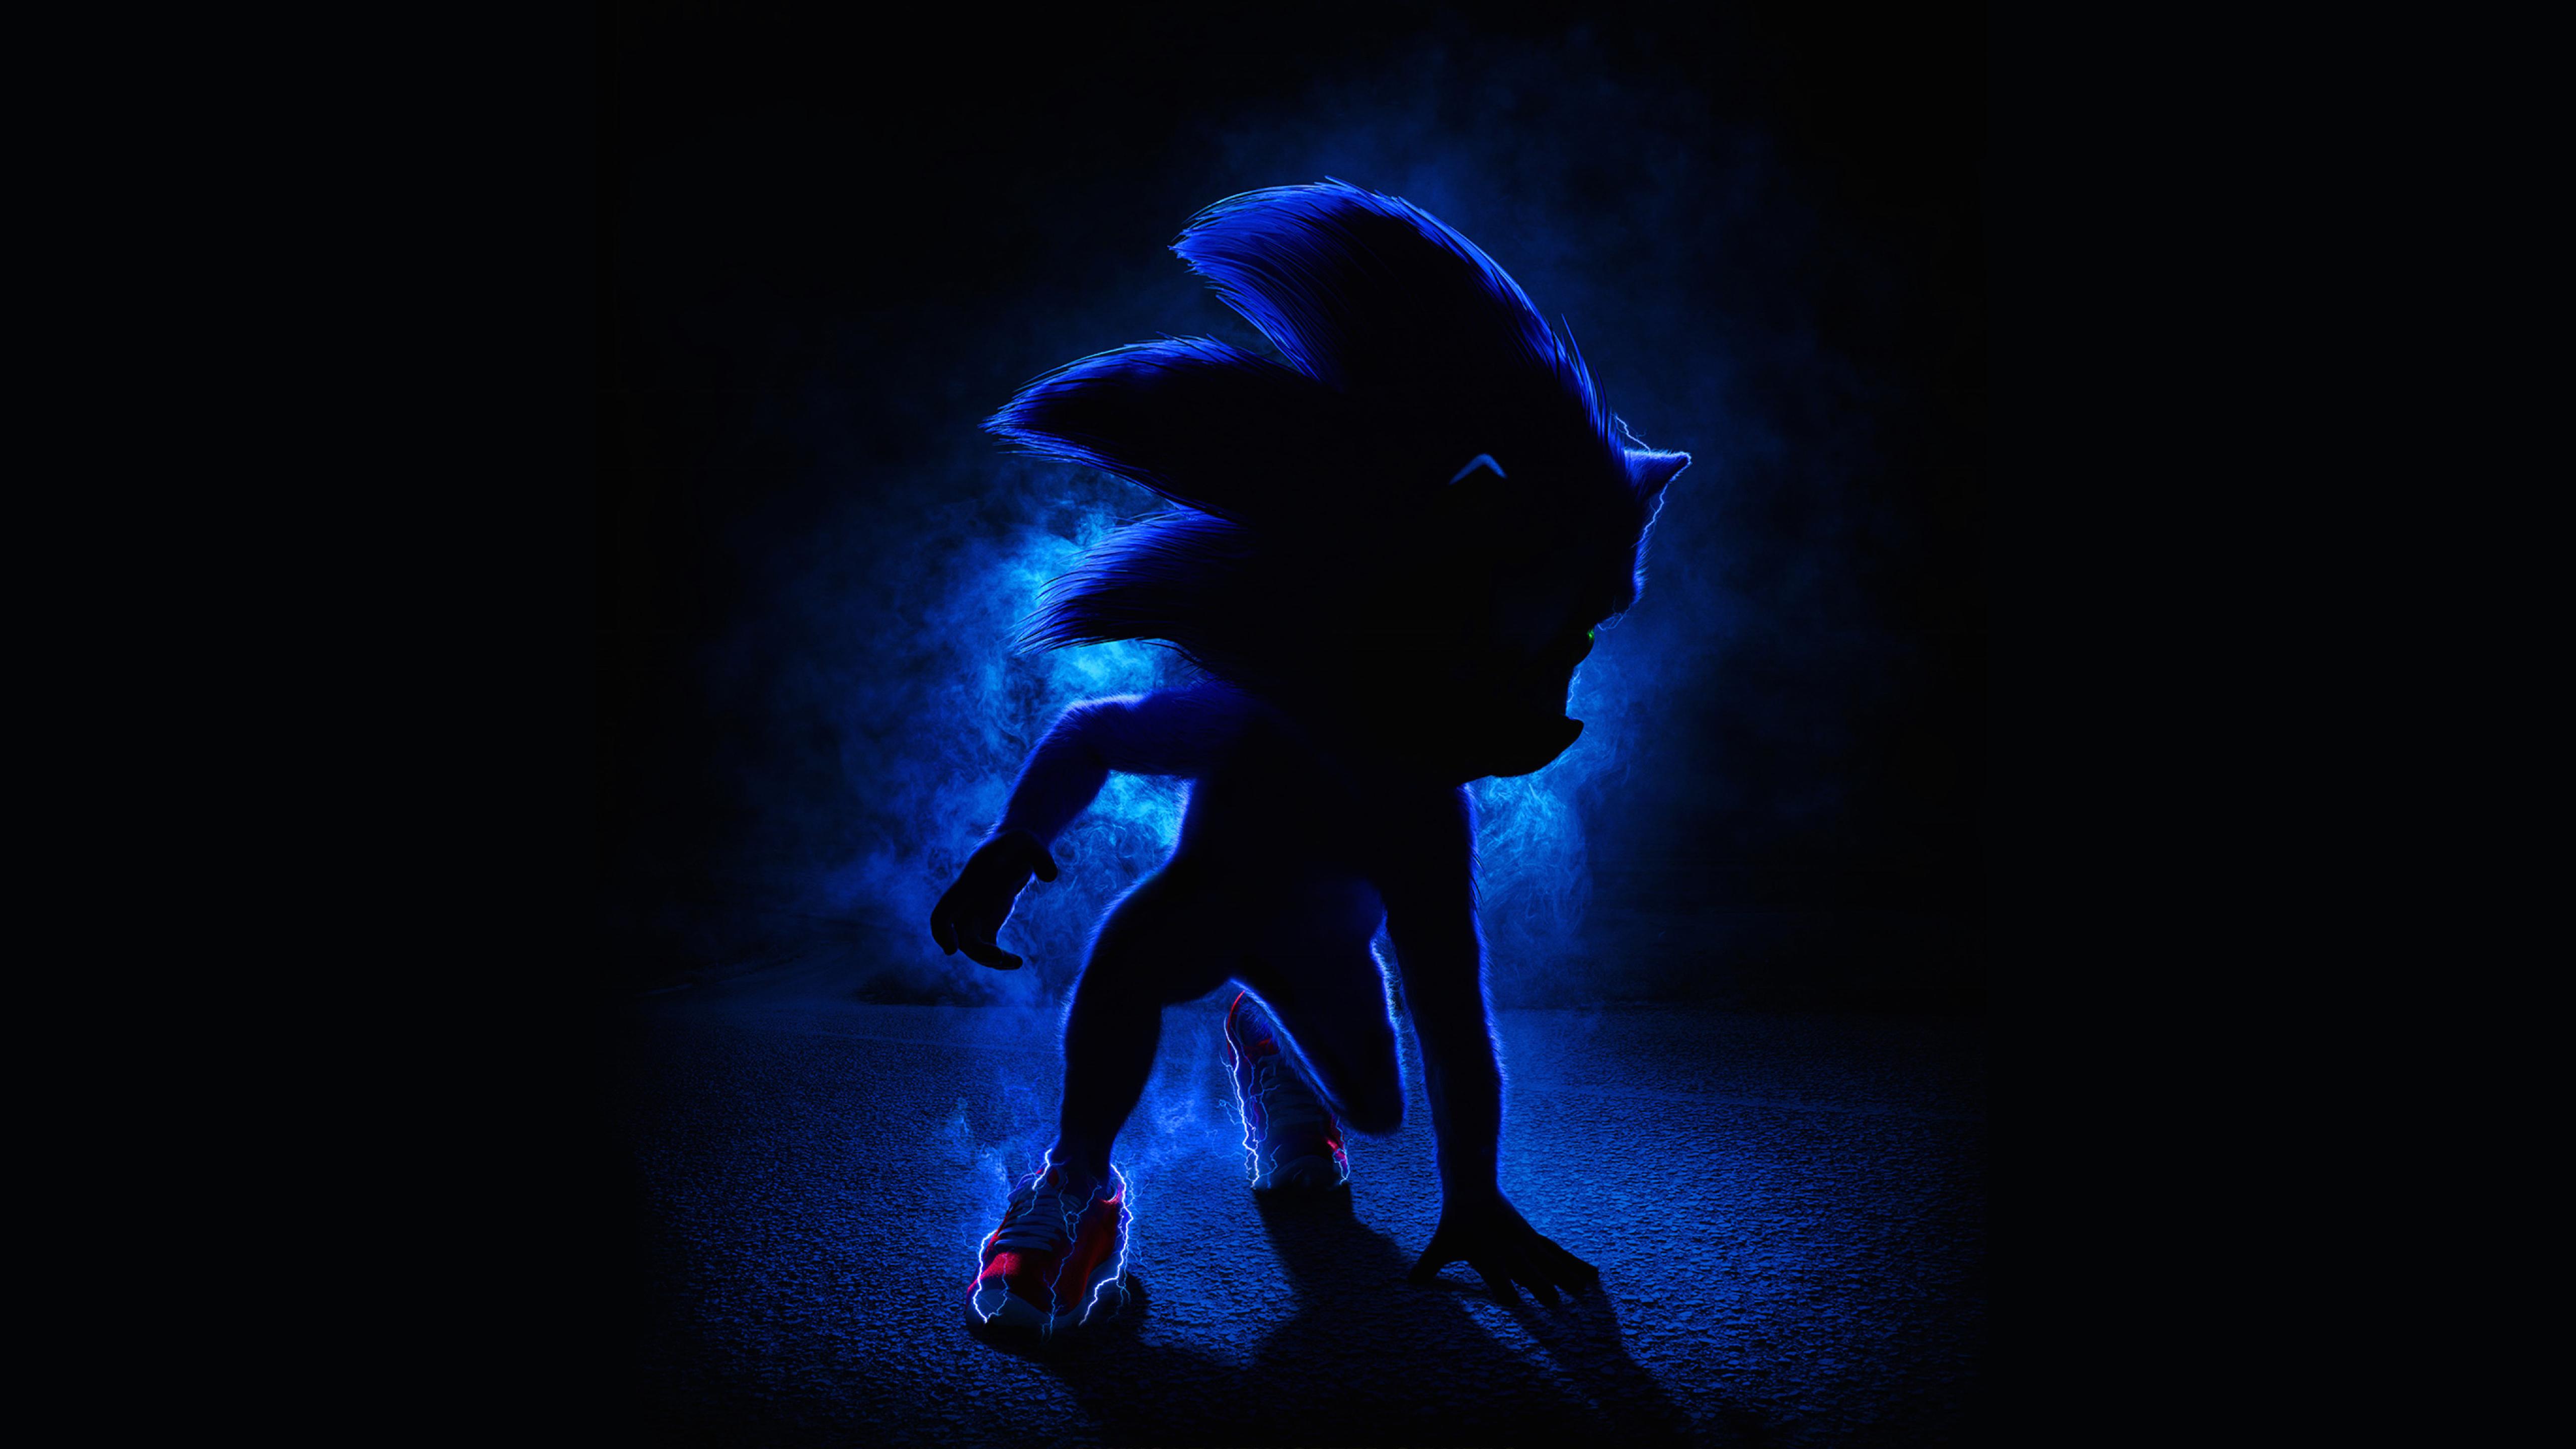 5120x2880 Sonic the Hedgehog 2019 Movie Poster 5K Wallpaper HD 5120x2880